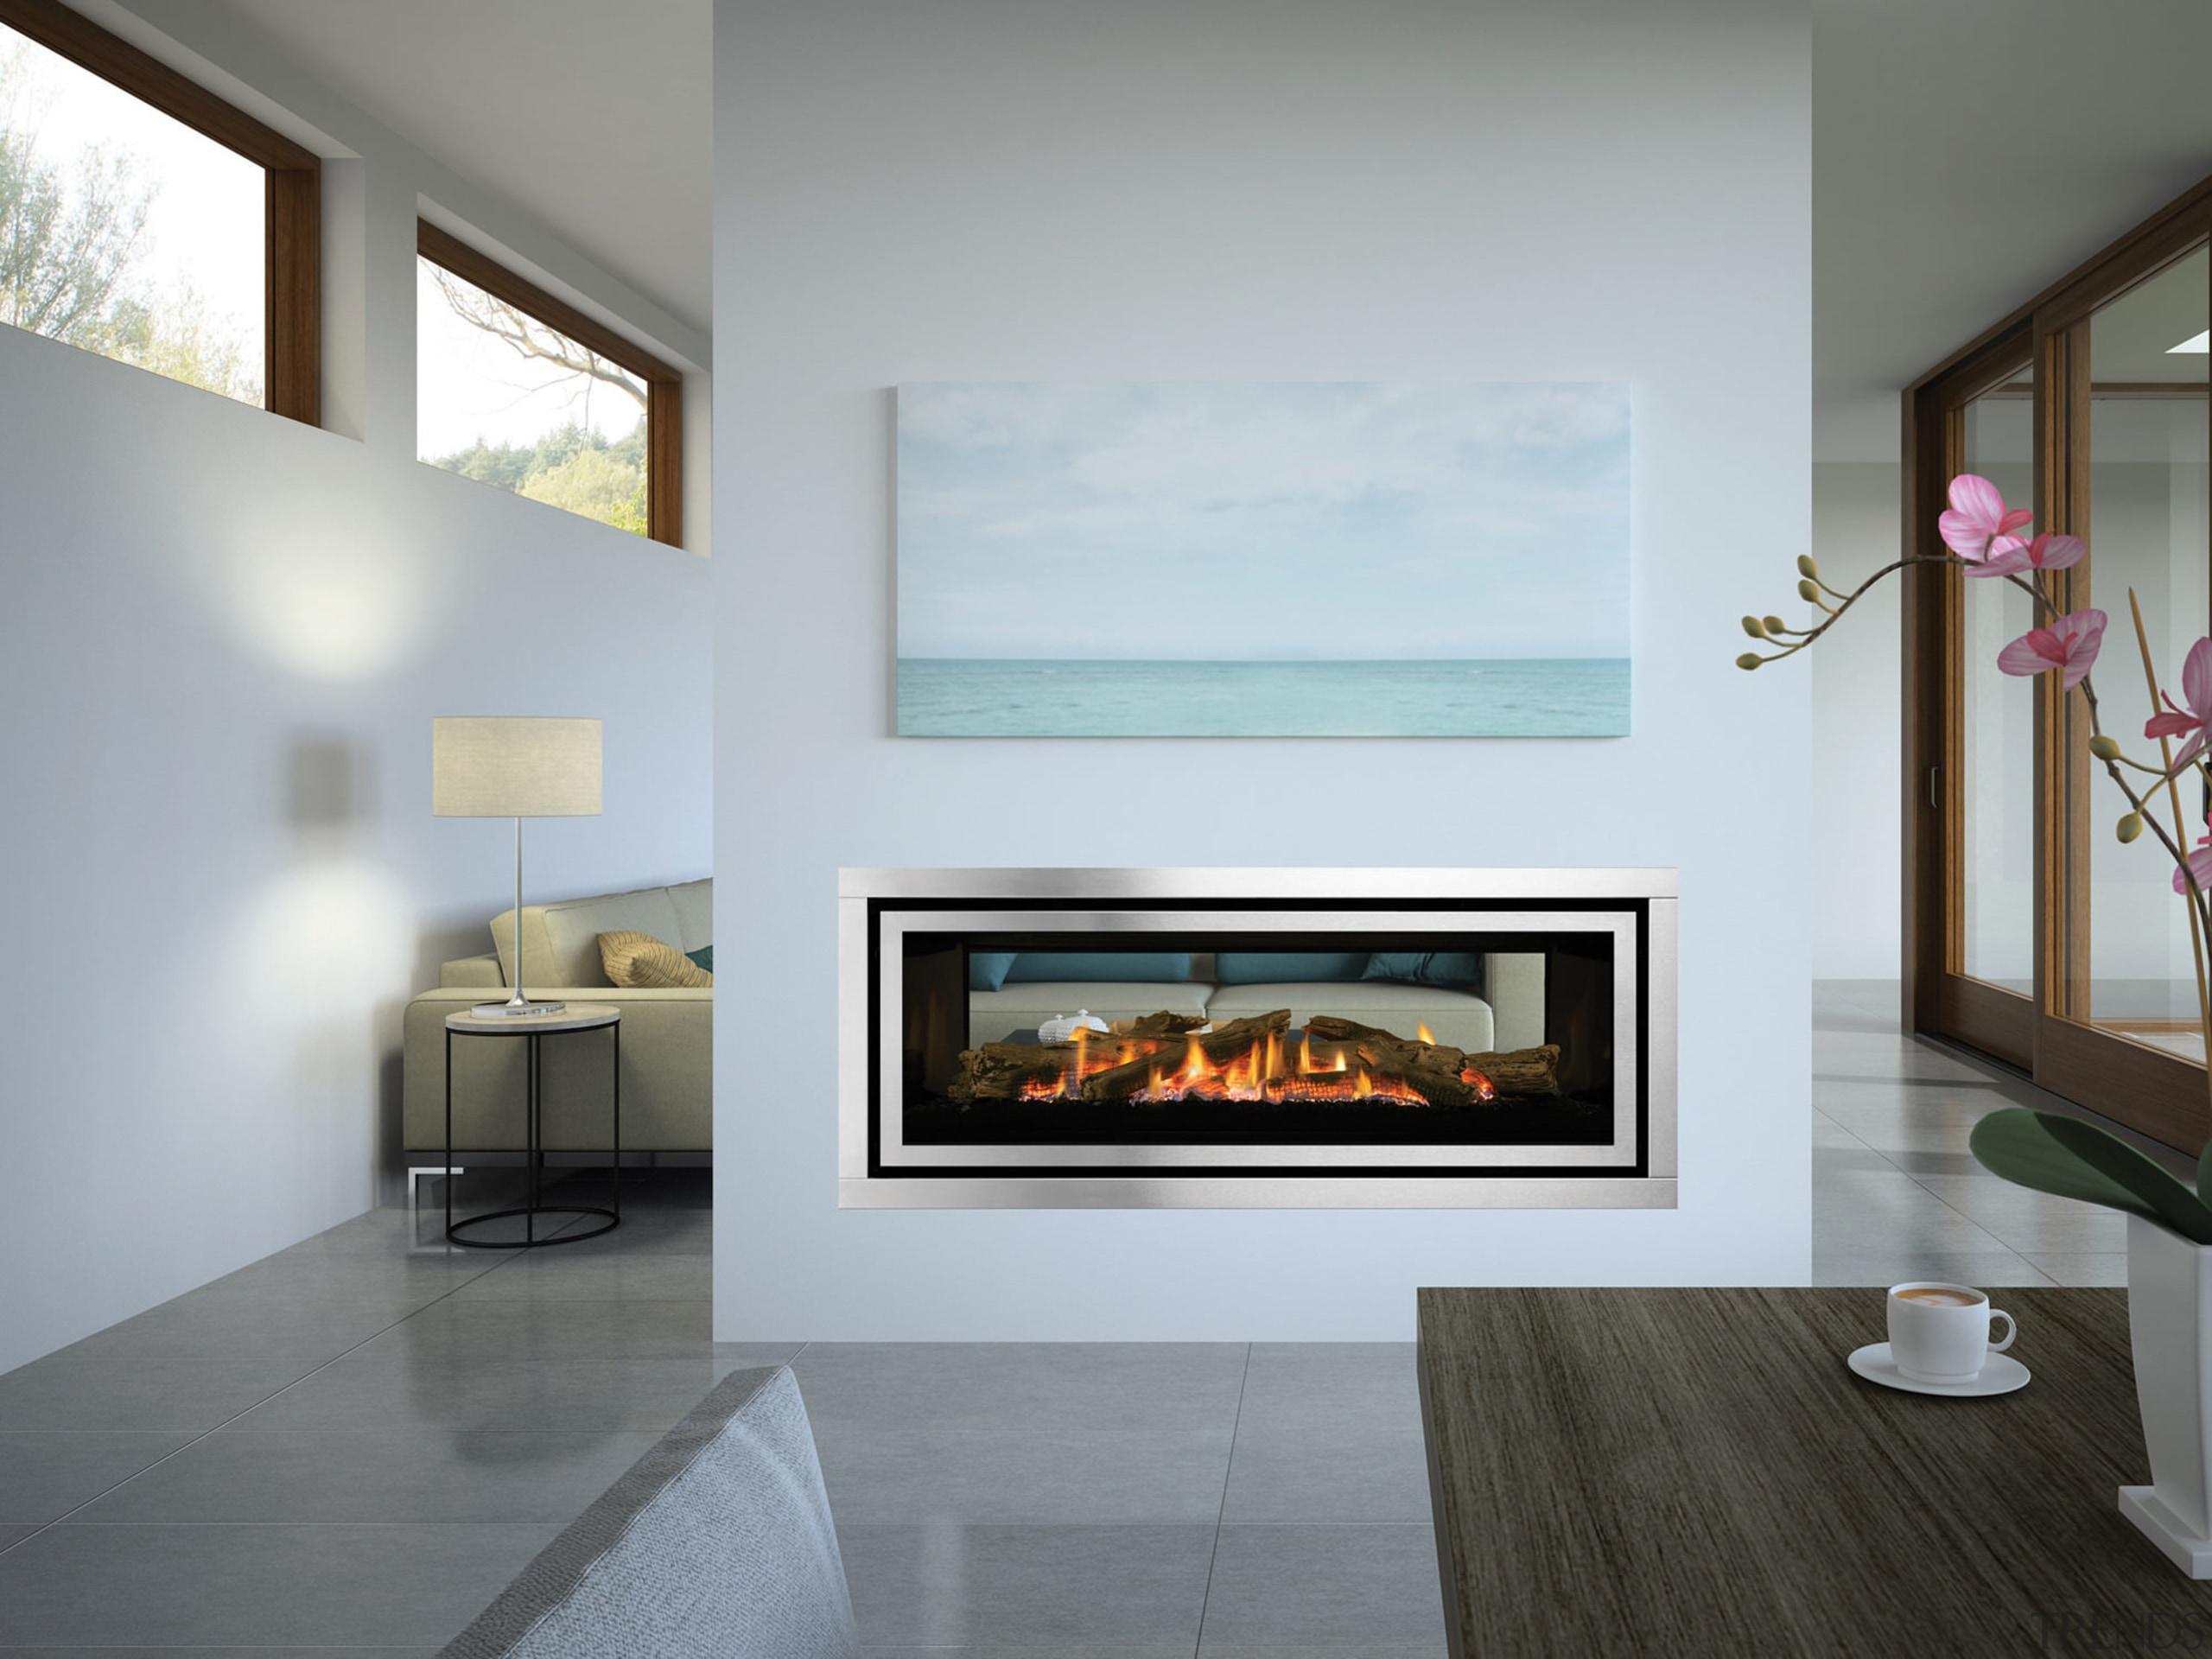 Regency Greenfire GF1500LST - Regency Greenfire GF1500LST - fireplace, hearth, interior design, living room, gray